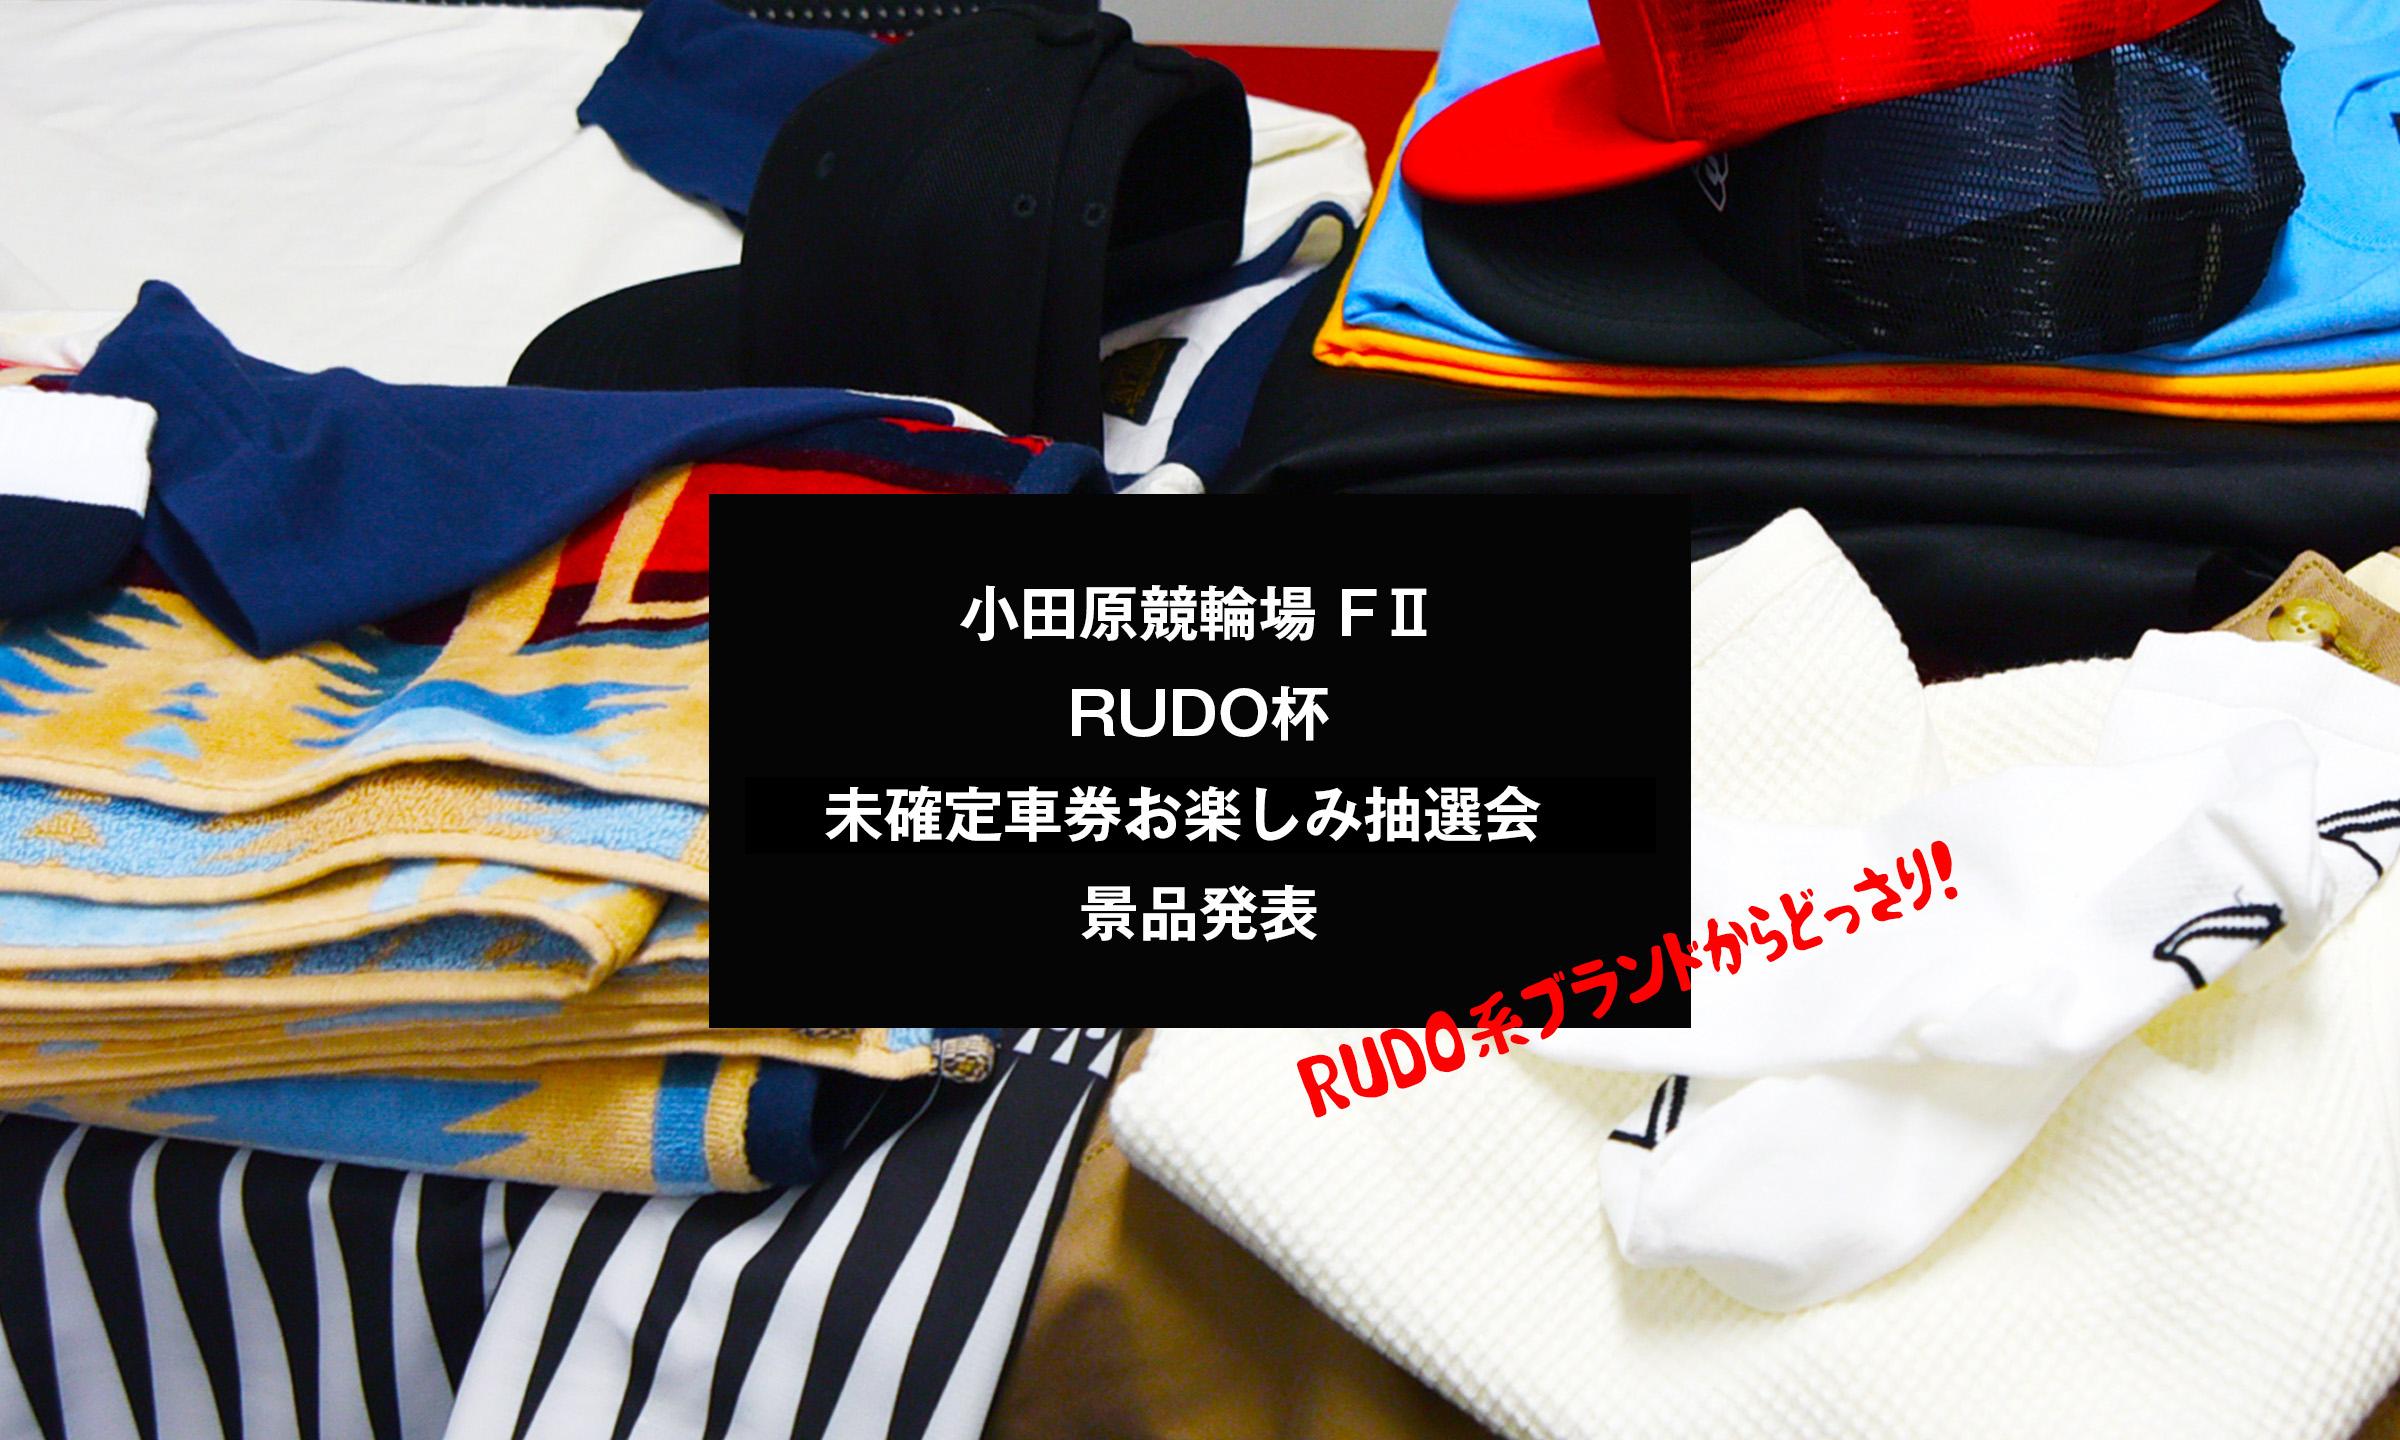 小田原競輪場 FⅡ「RUDO杯」ー未確定車券お楽しみ抽選会 景品発表ー